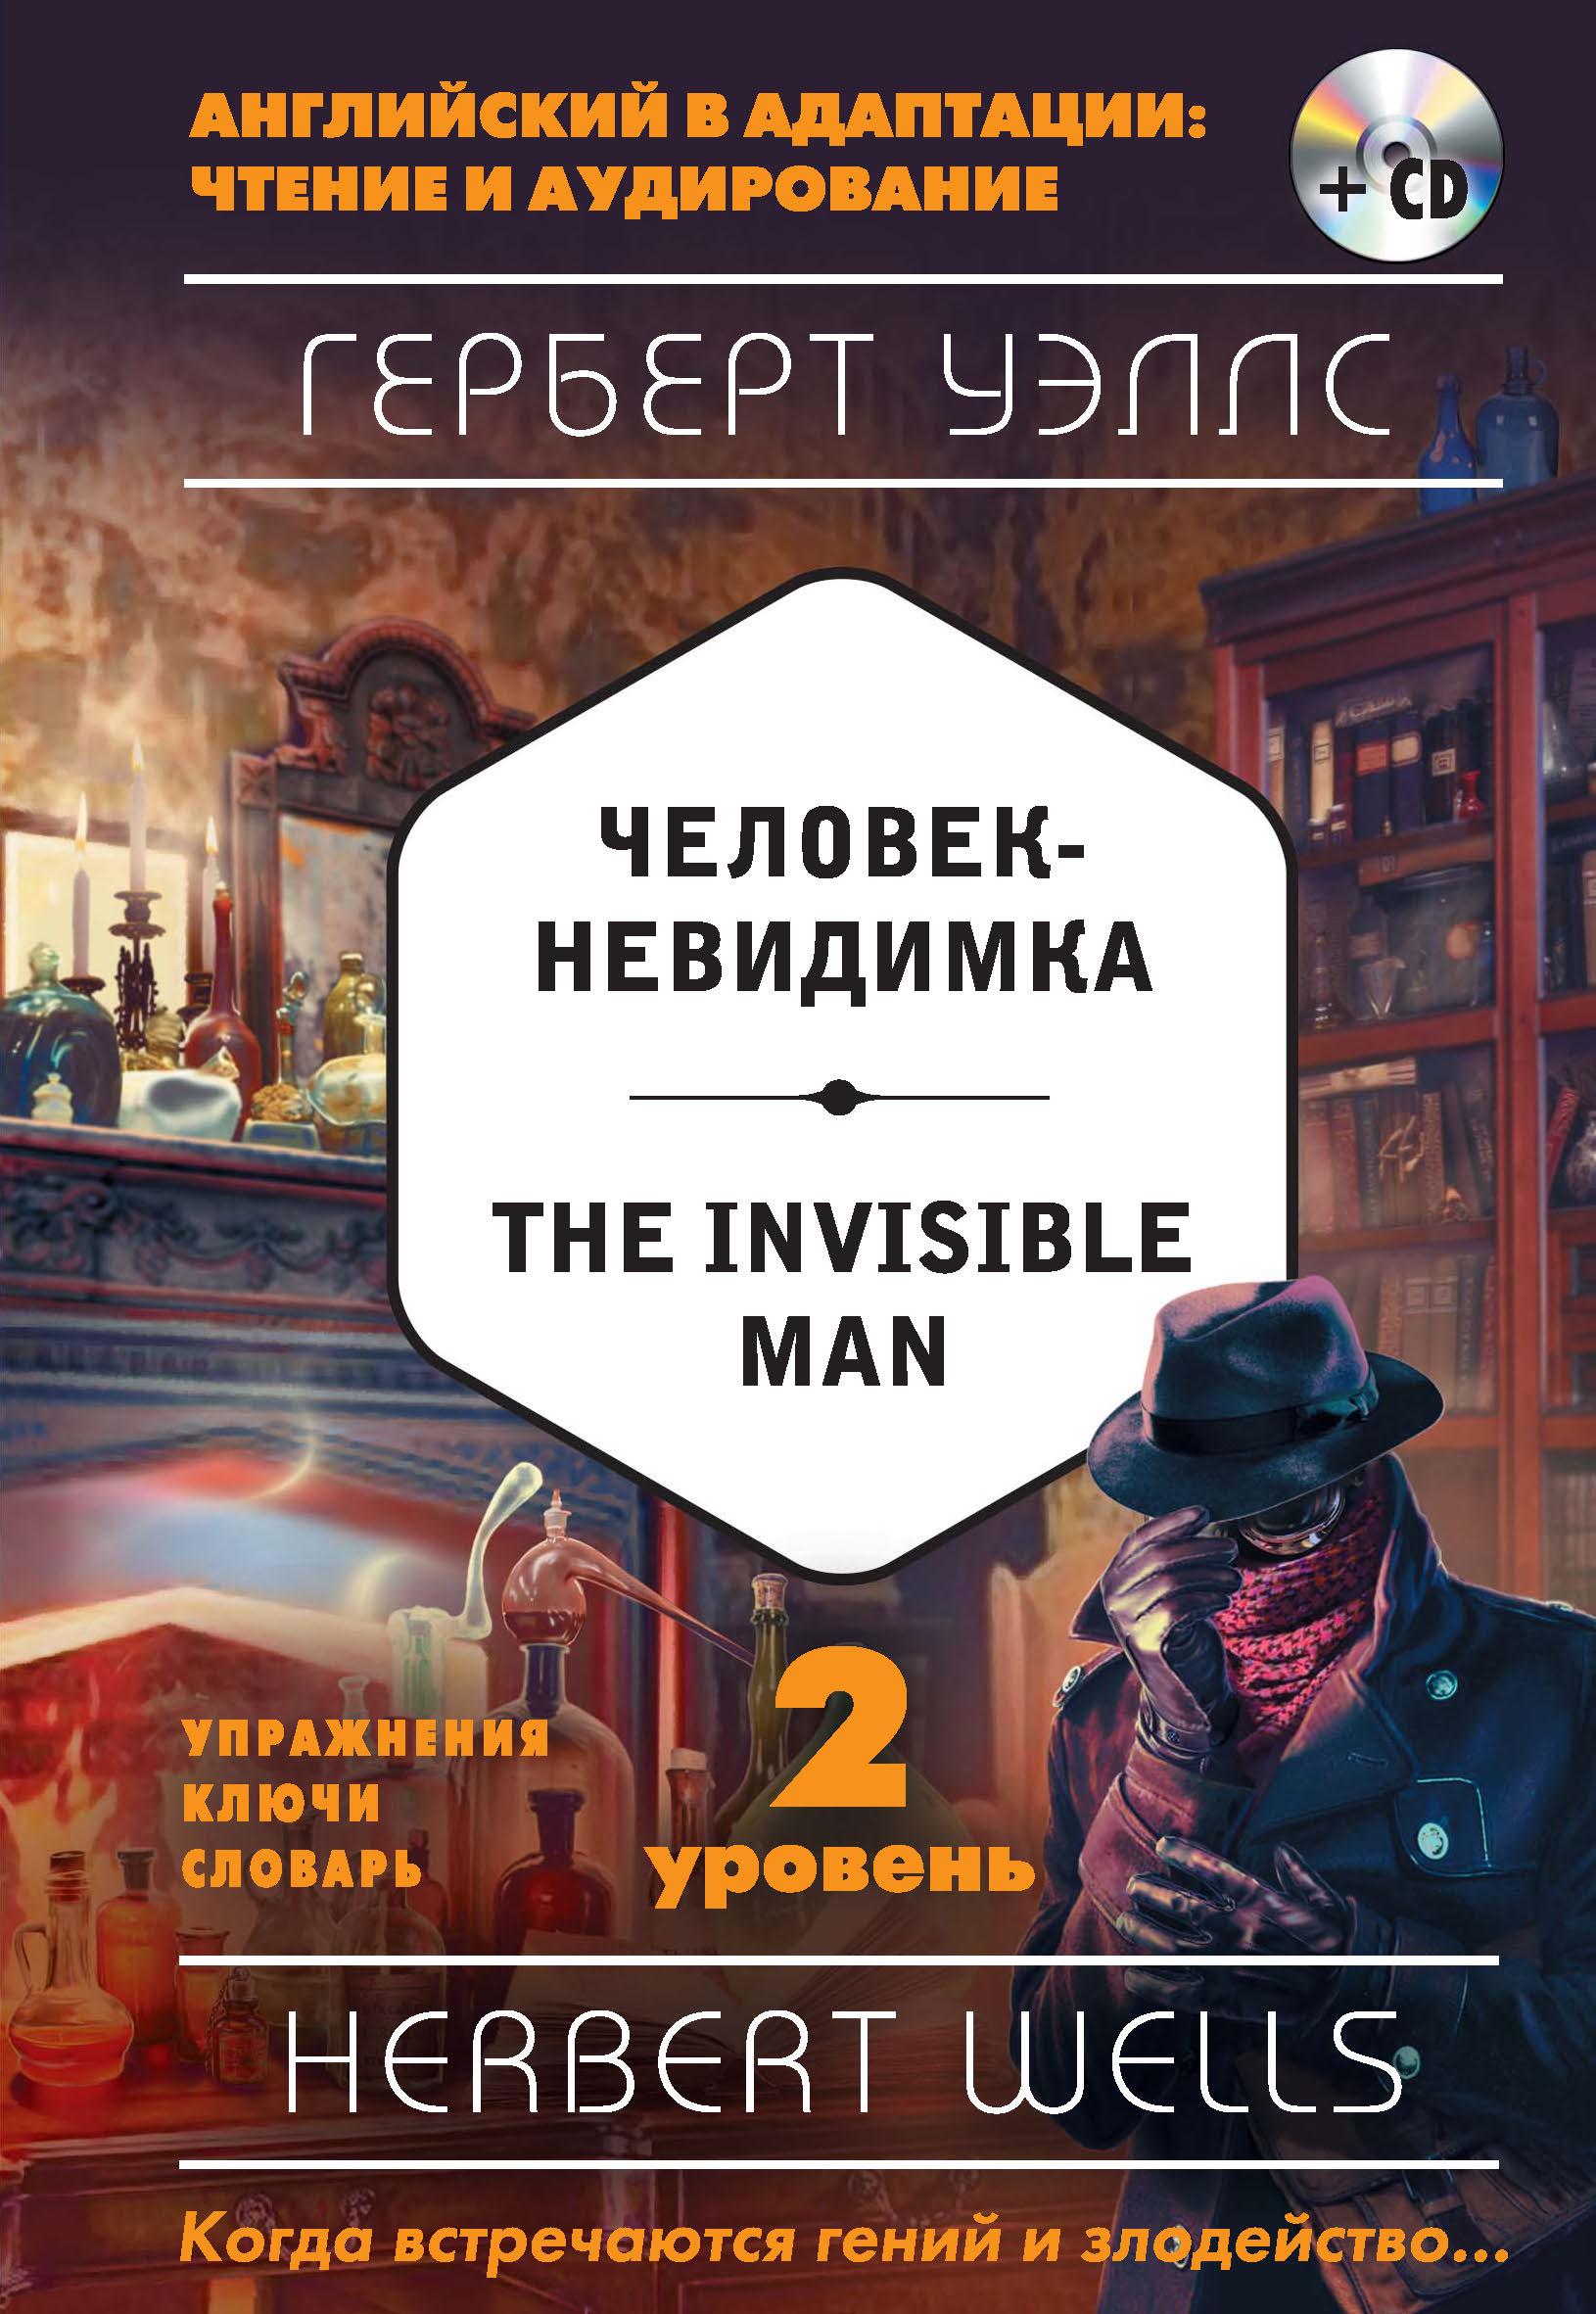 chelovek nevidimka the invisible man 2 uroven mp3